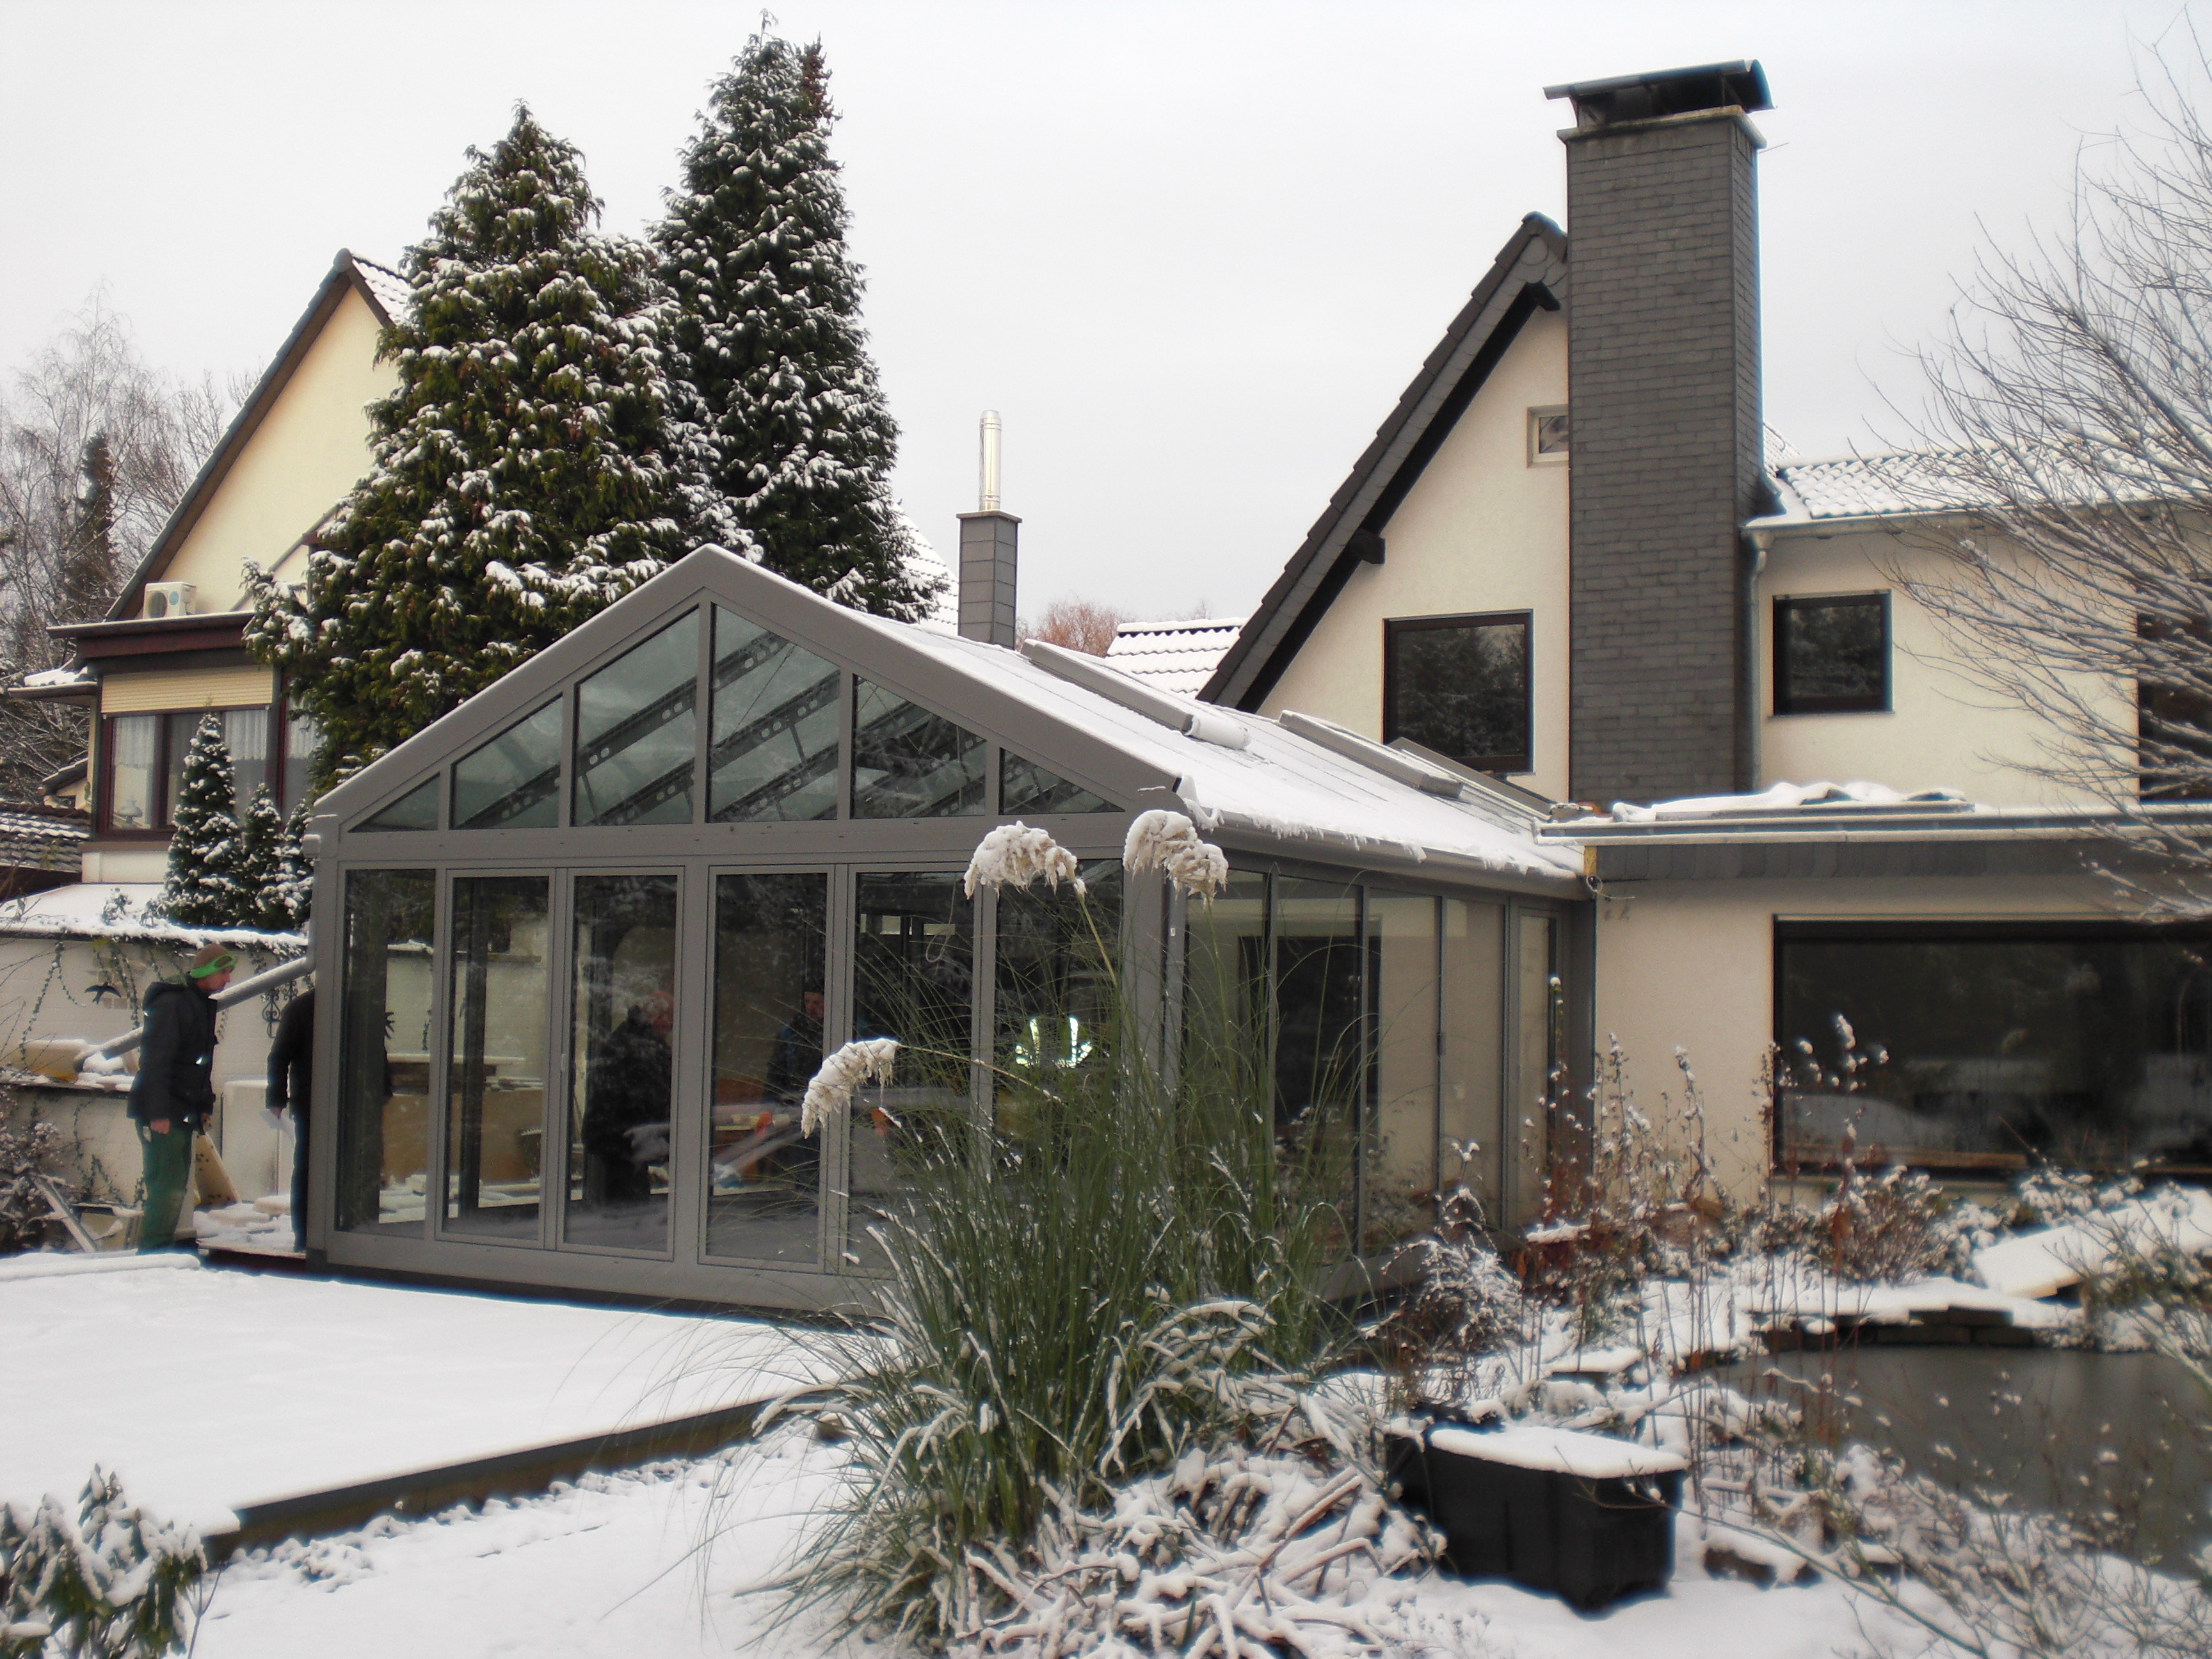 wintergarten fortuna wintgergarten